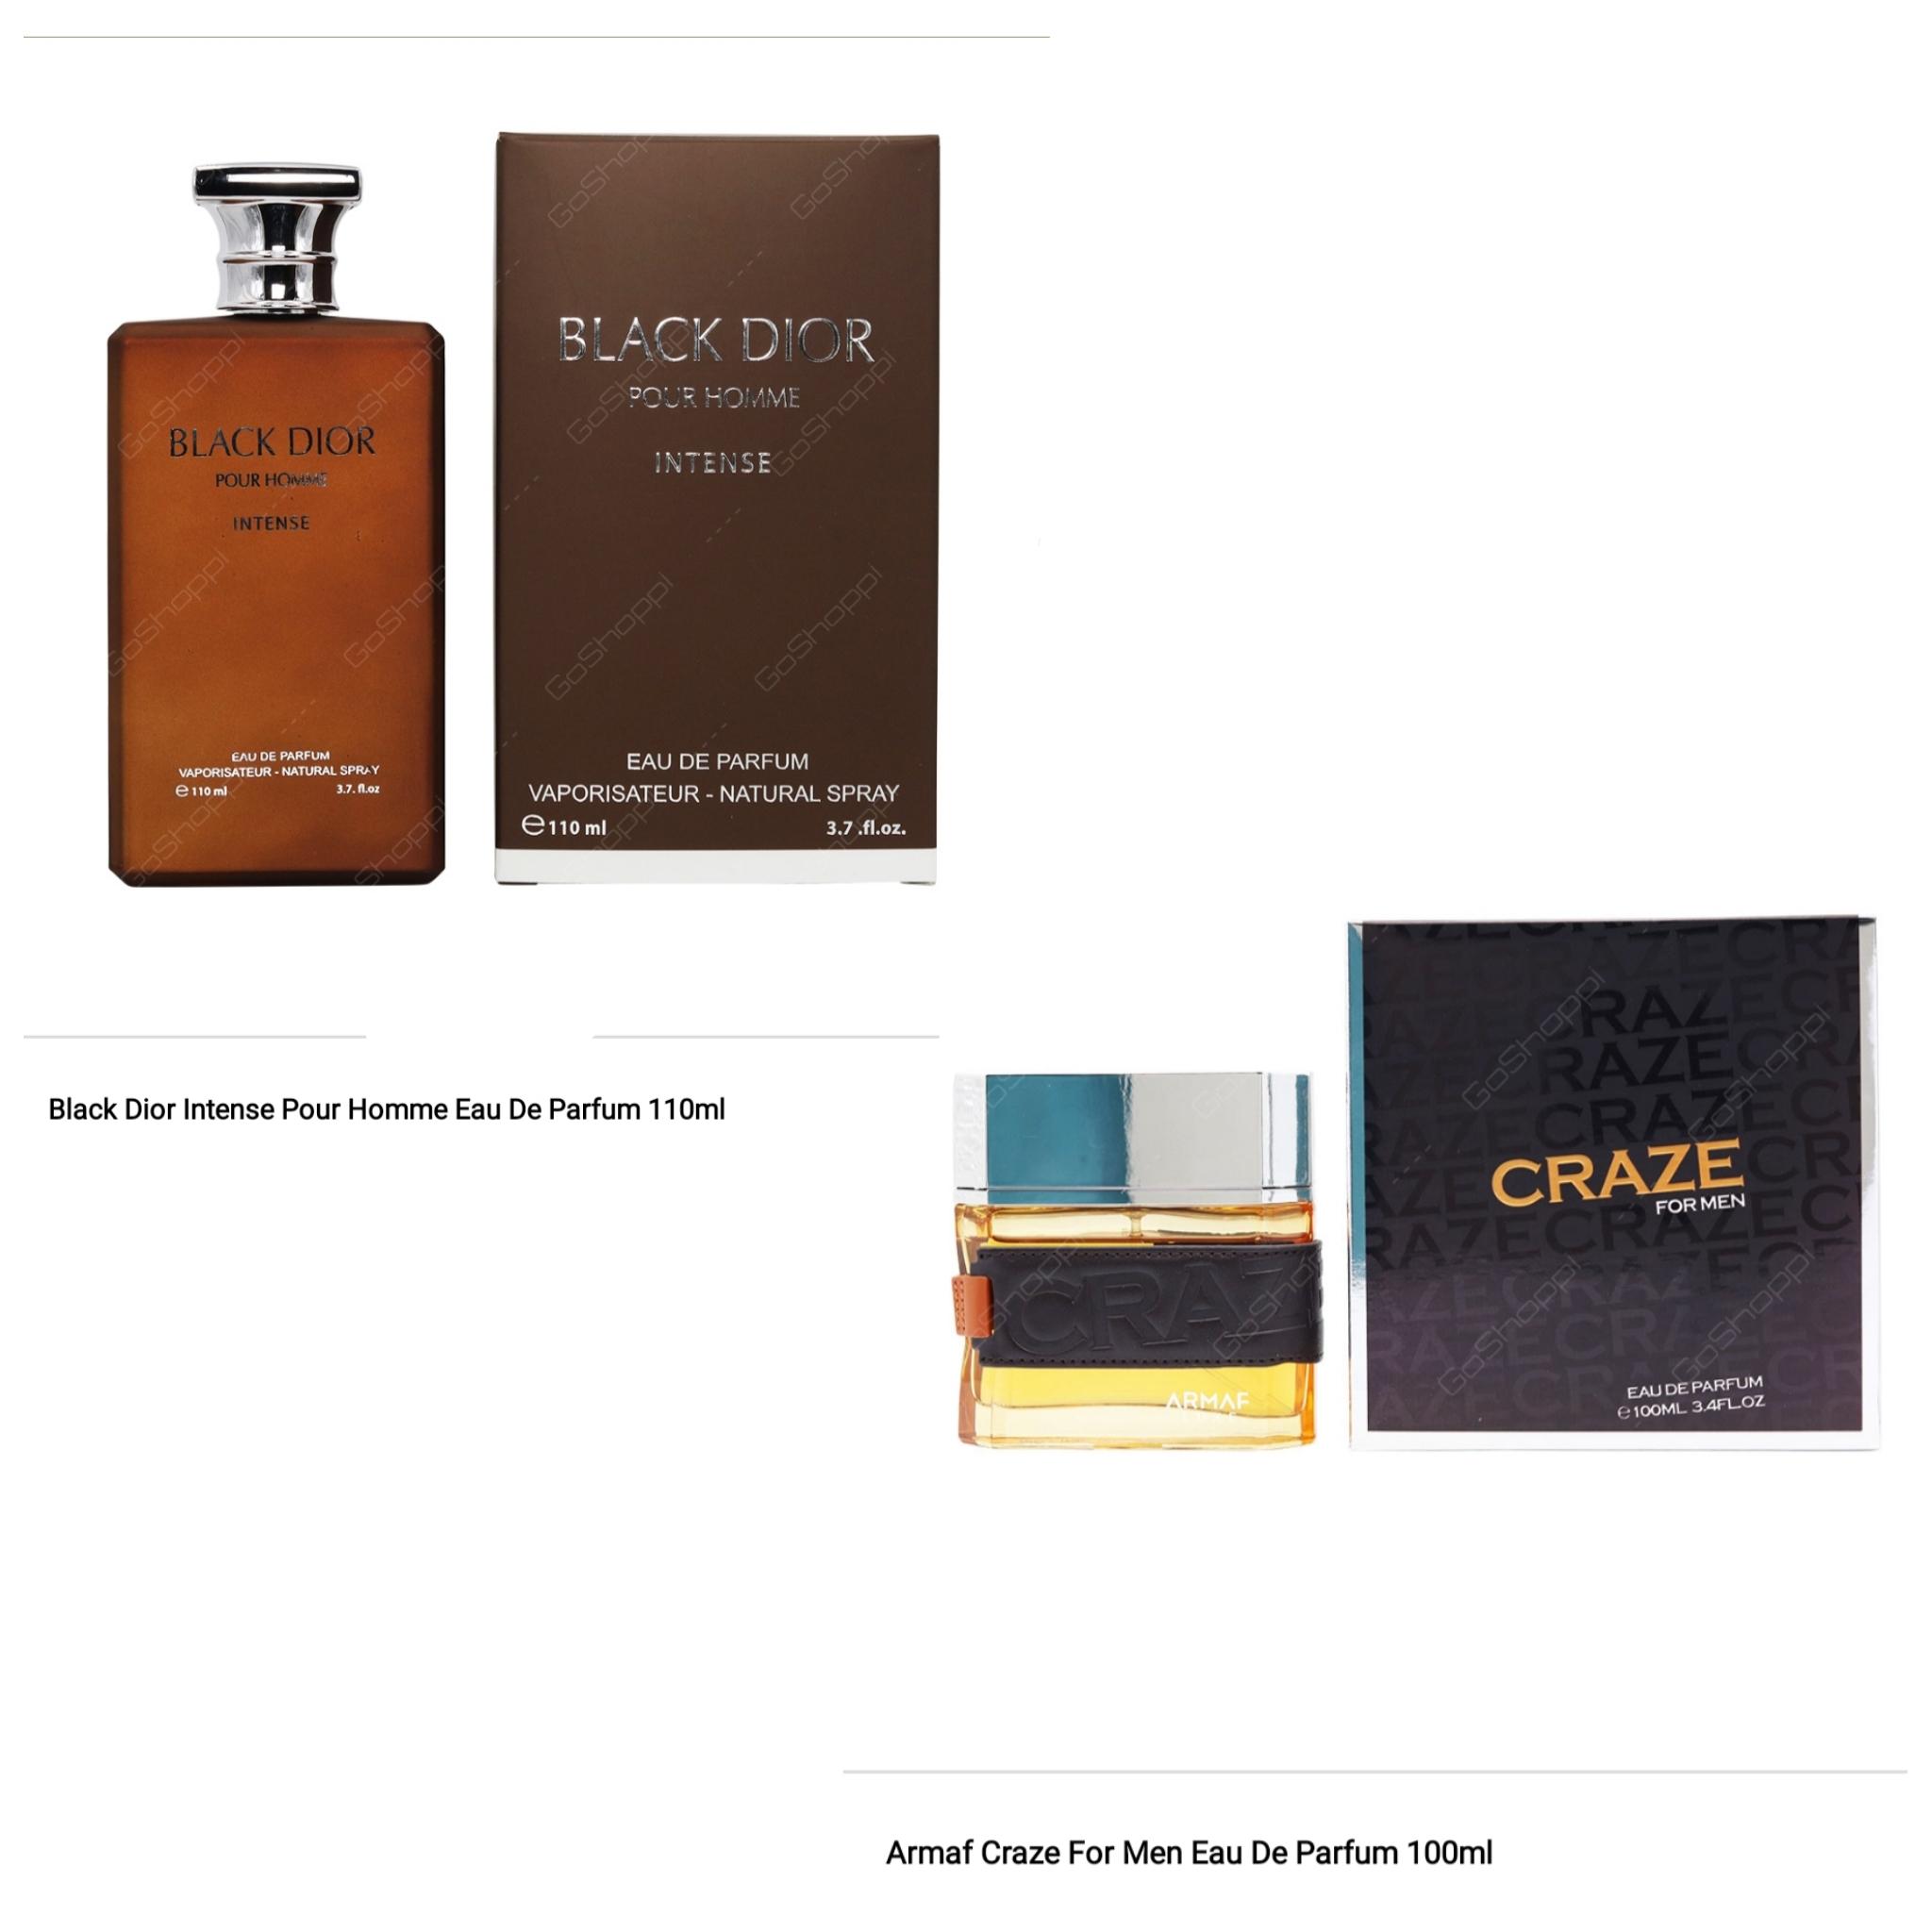 Armaf Craze 100ml and Black Dior Intense 100ml Offer